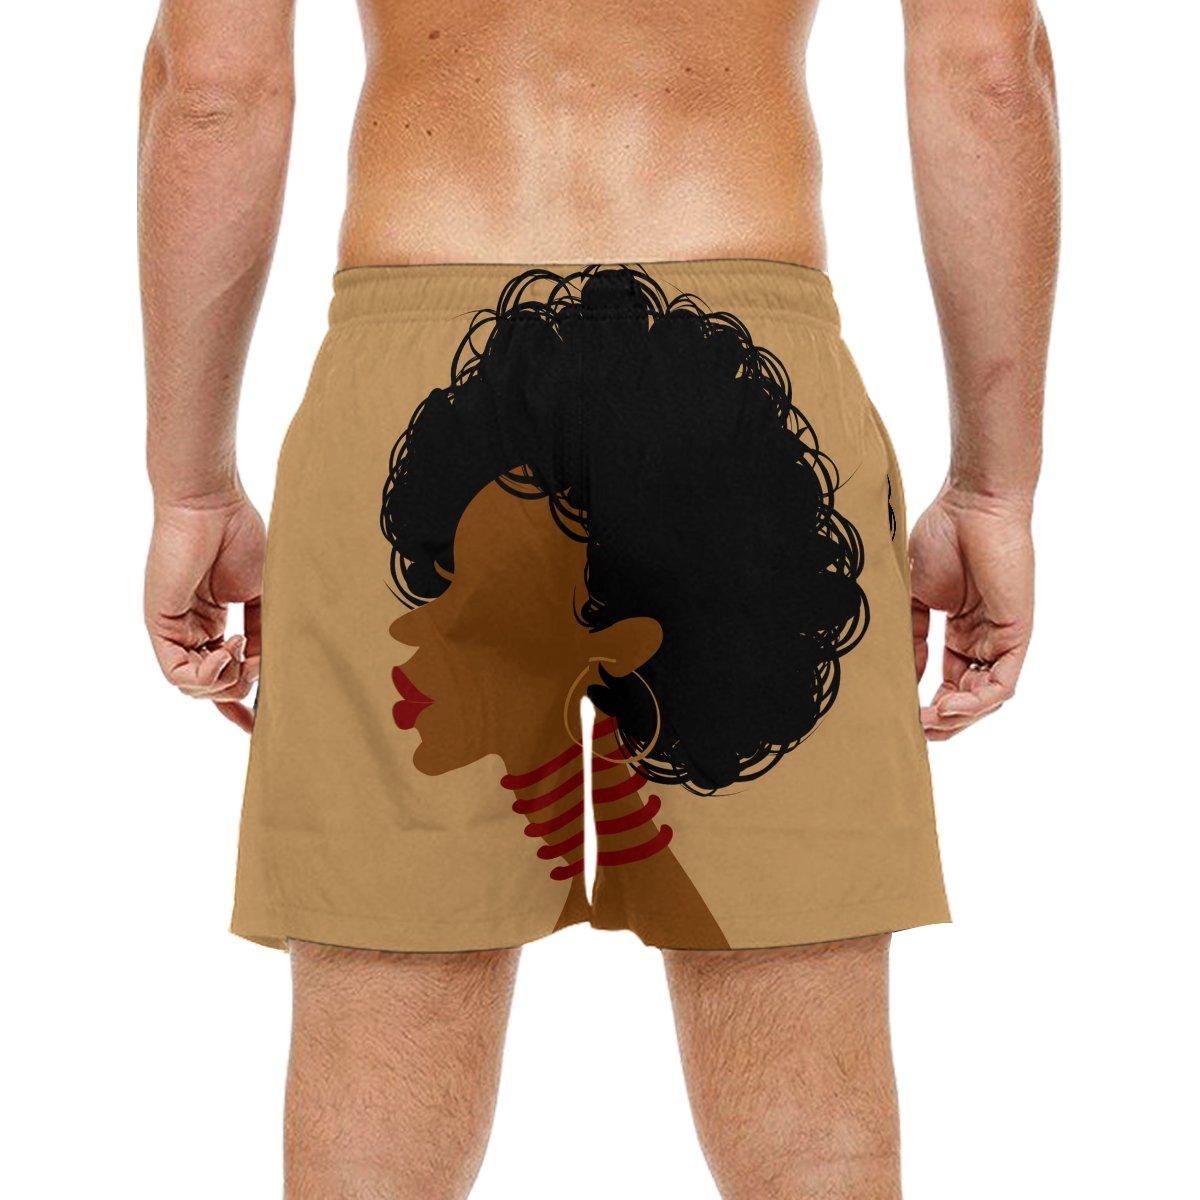 KEAKIA Mens African Woman Beach Board Shorts Quick Dry Swim Trunk